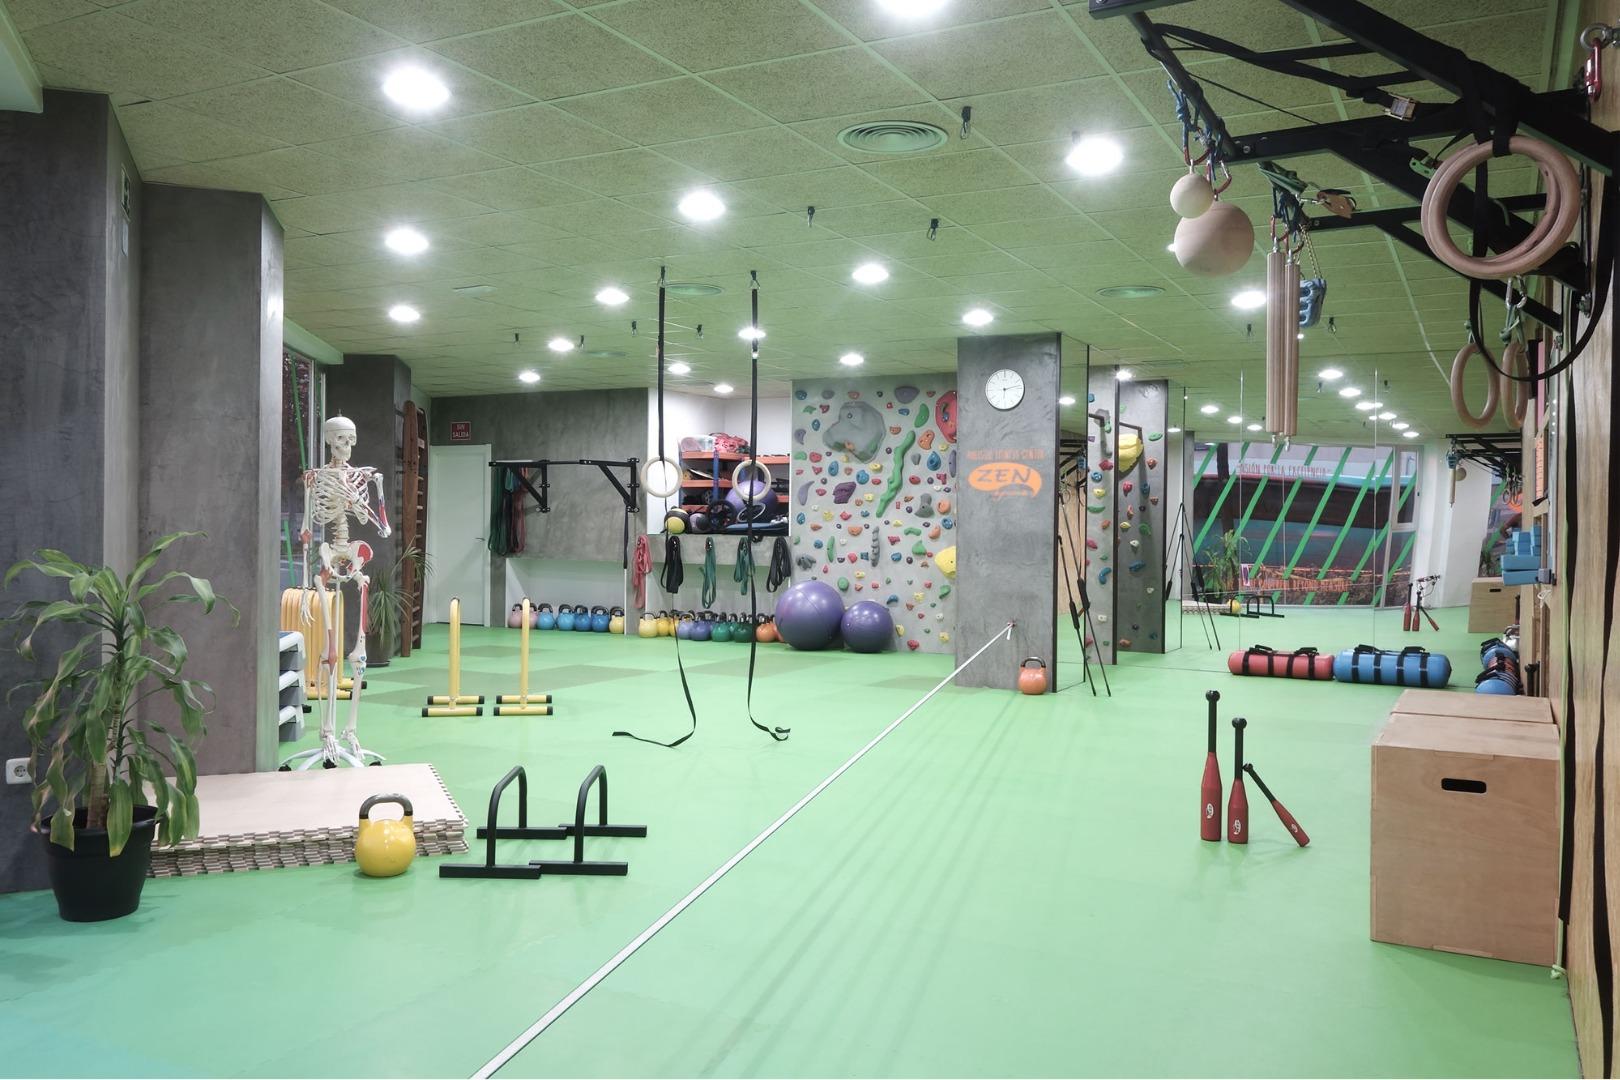 Oferta gimnasio centro zen dynamics alcobendas gymforless - Gimnasio en alcobendas ...